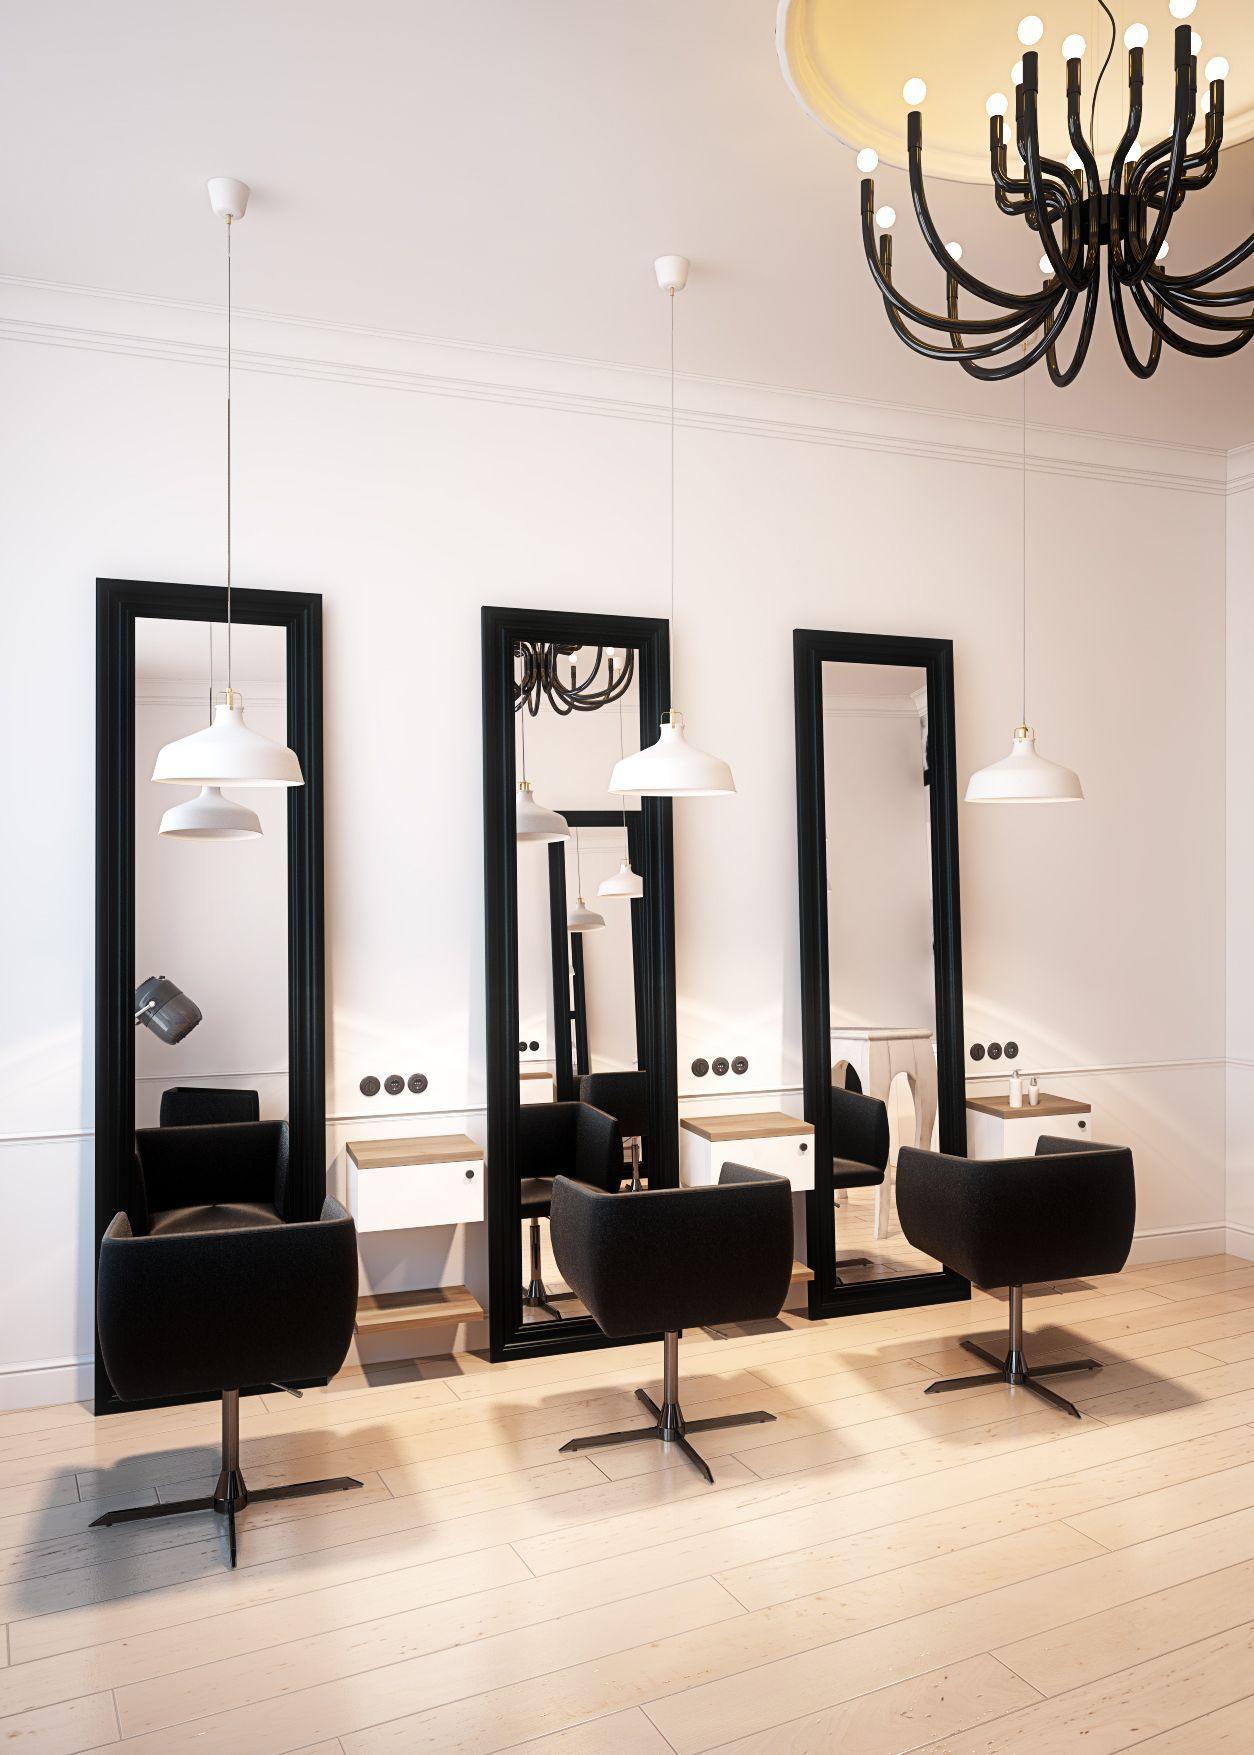 15 Ideas For A Stylish Beauty Salon Salon interior